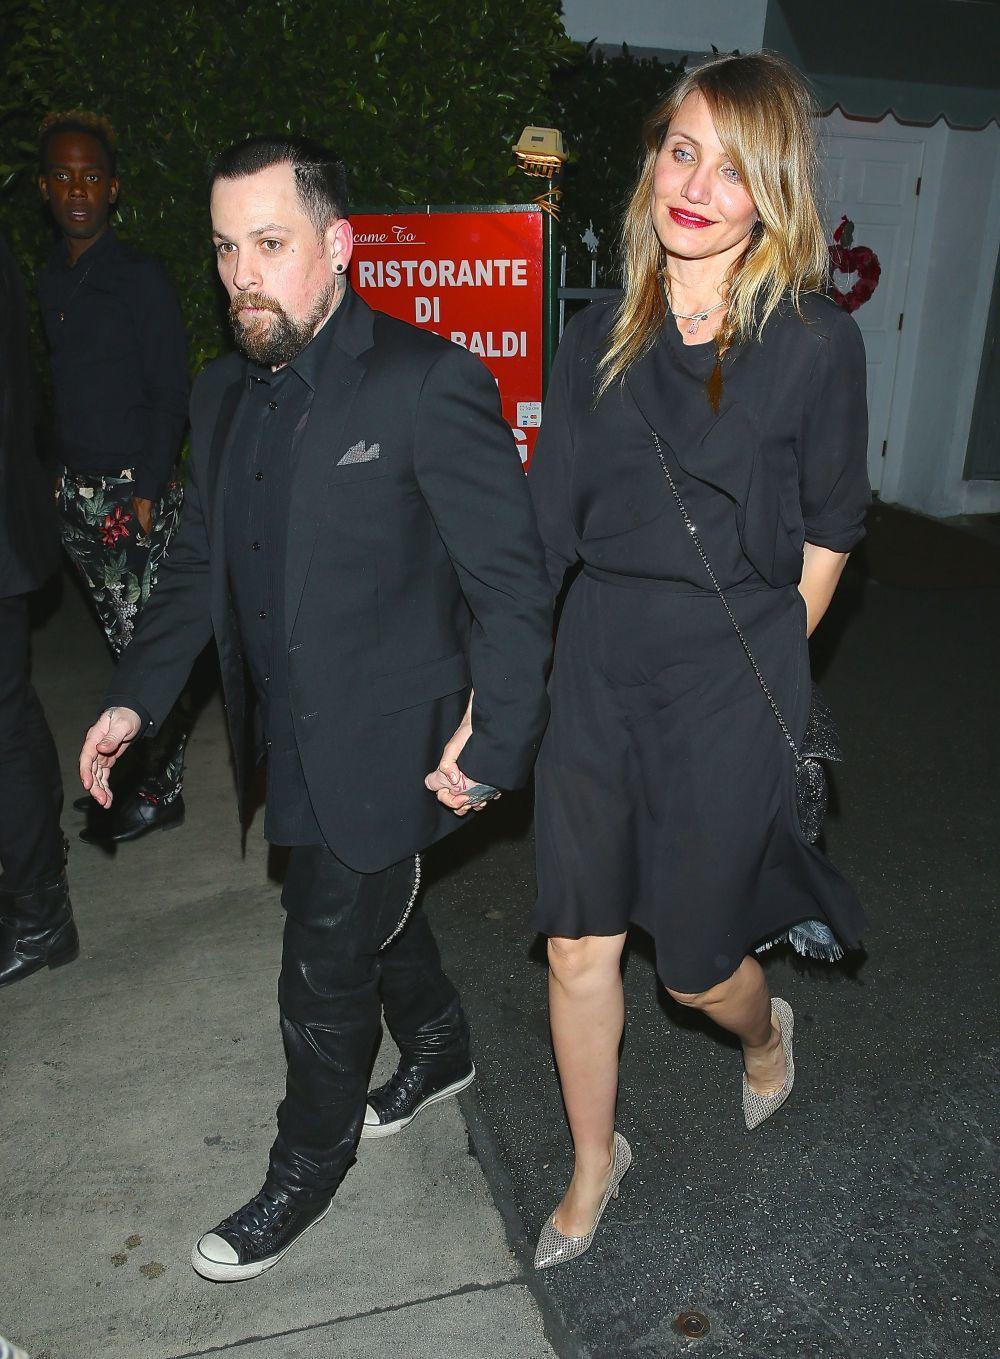 Cameron Diaz y su marido, Benji Madden.